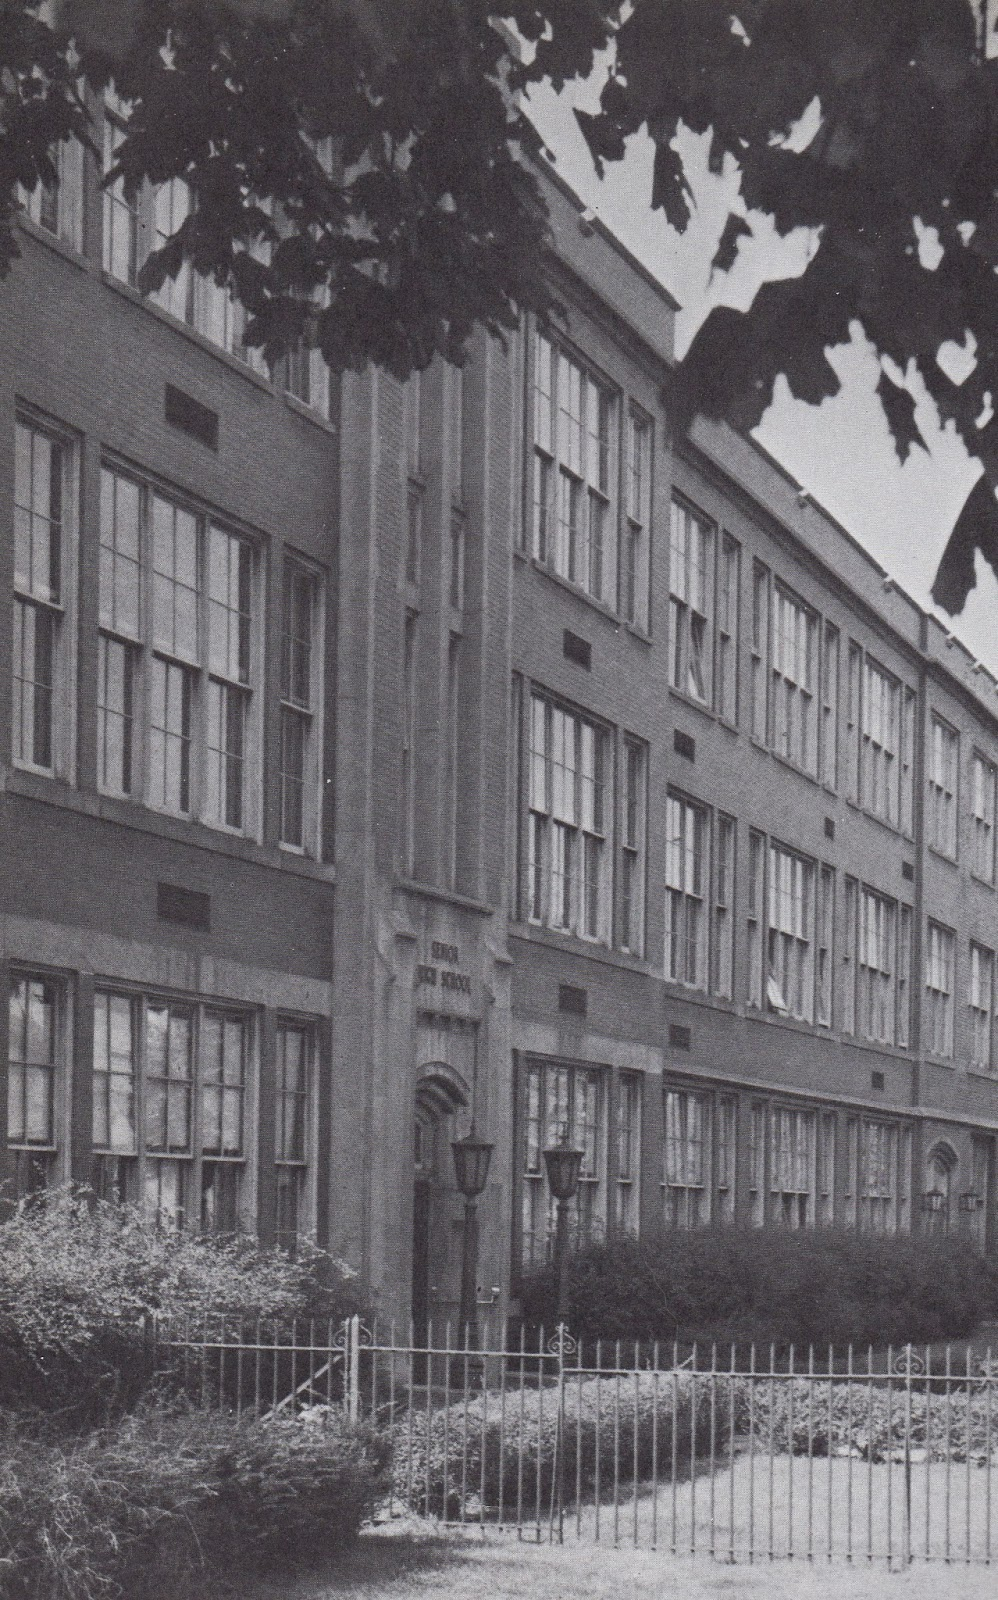 Ambridge Memories The Demolition Of The Old Ambridge High School